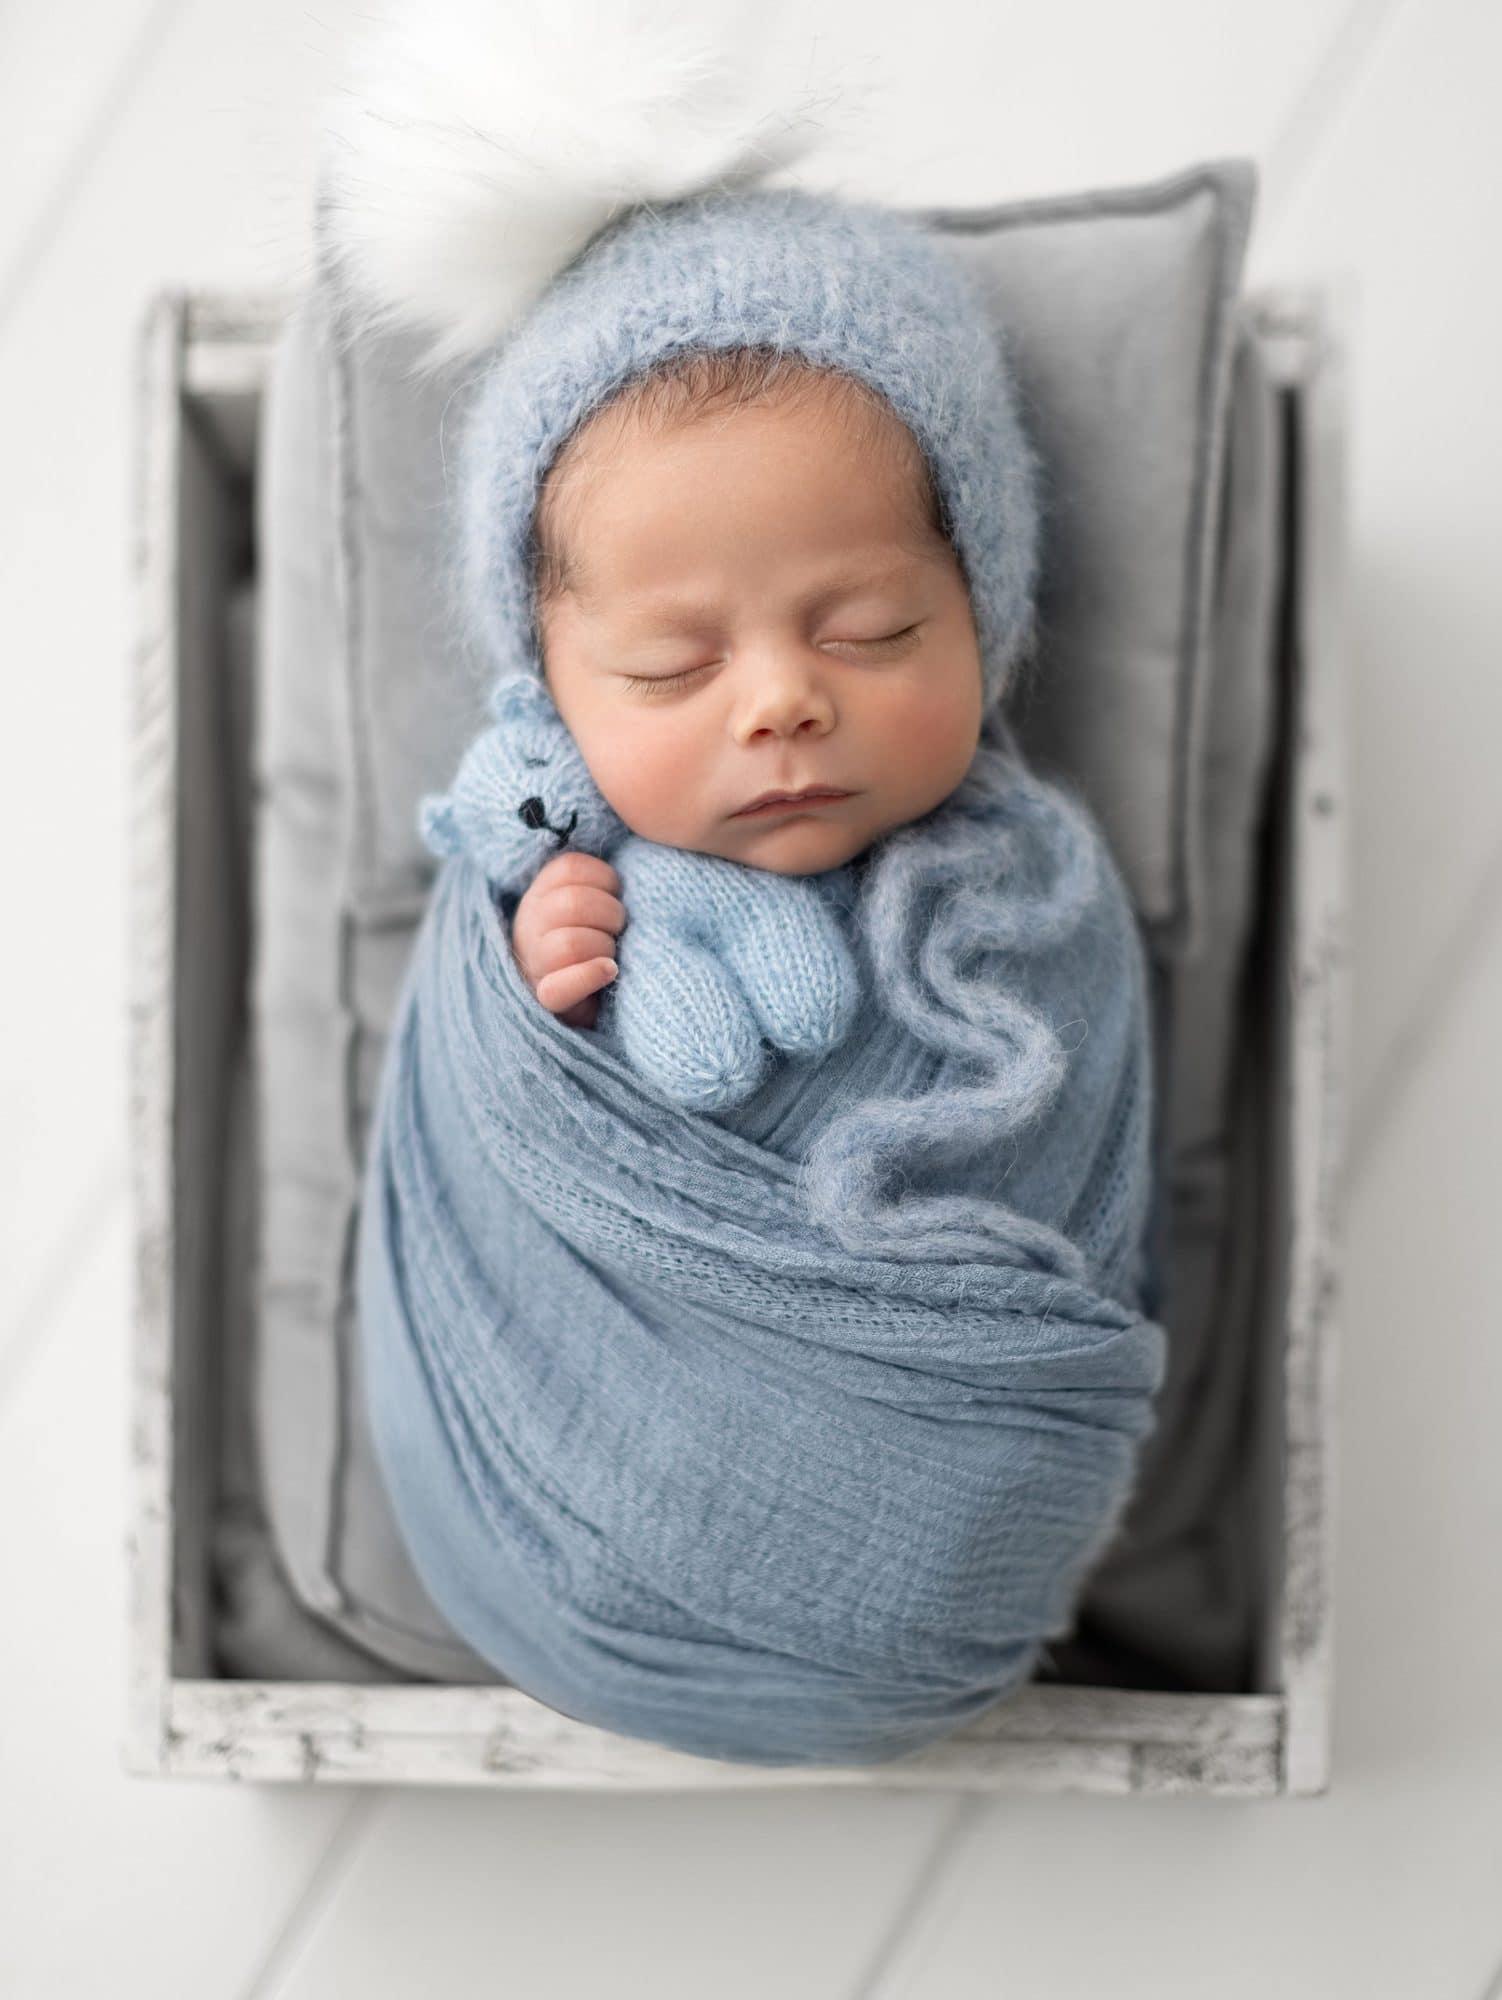 Baby boy in white wooden crate cuddles his blue teddy during his Newborn Photoshoot in Suffolk Studio